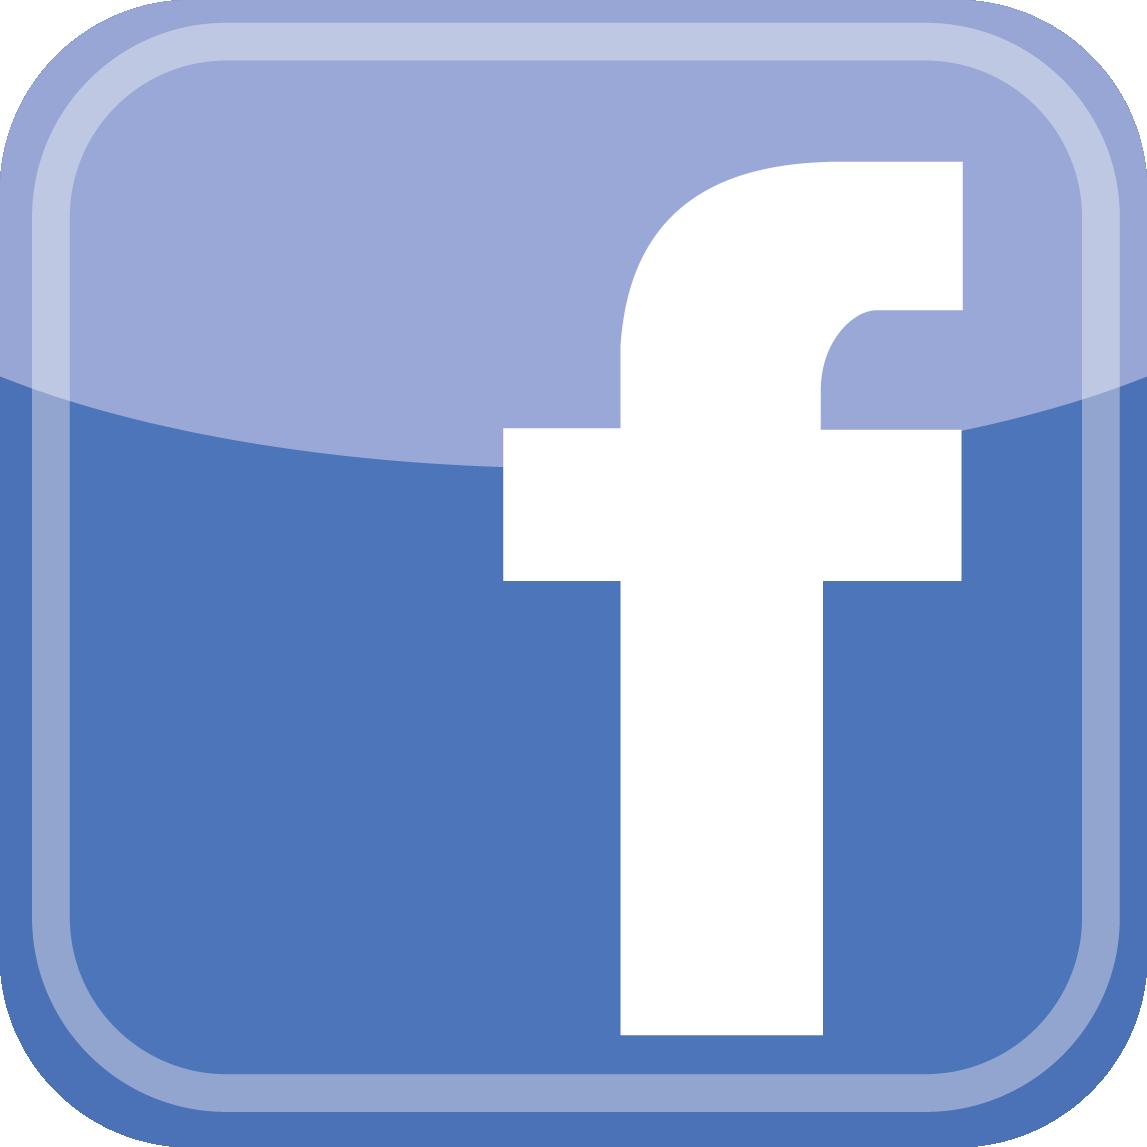 Facebook_logo-7.png